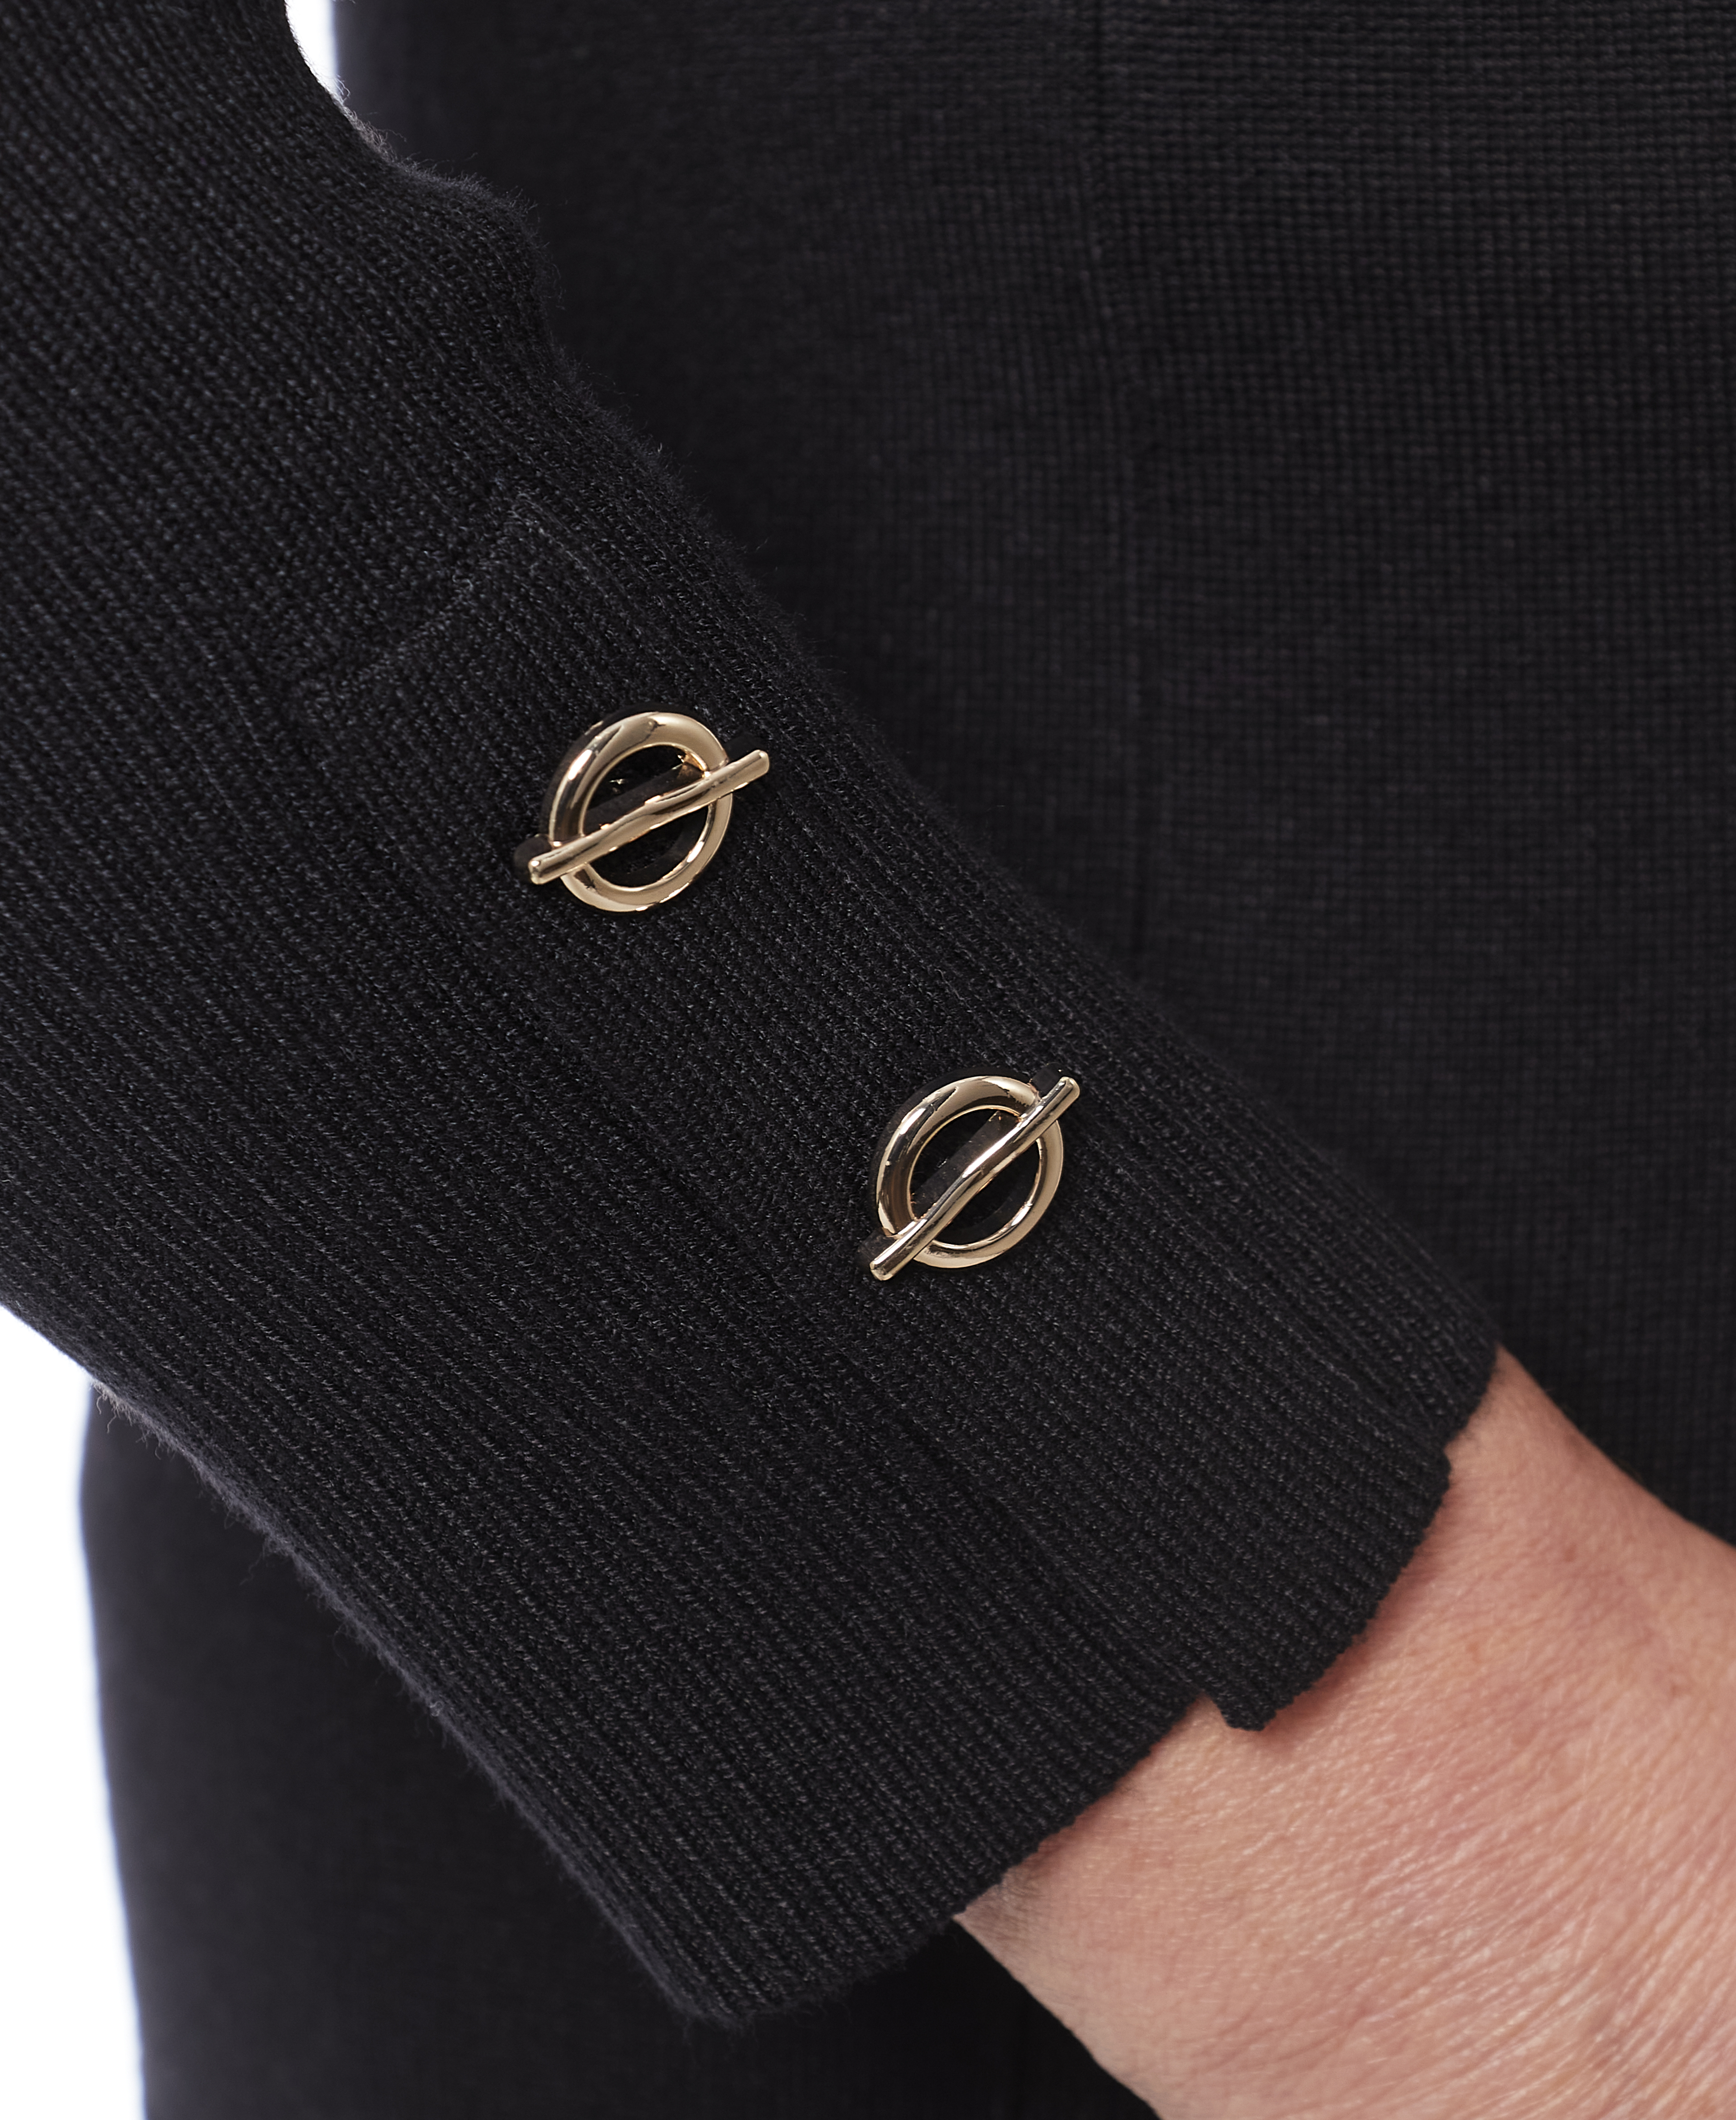 Petite Grommet Cuff Sweater in Black